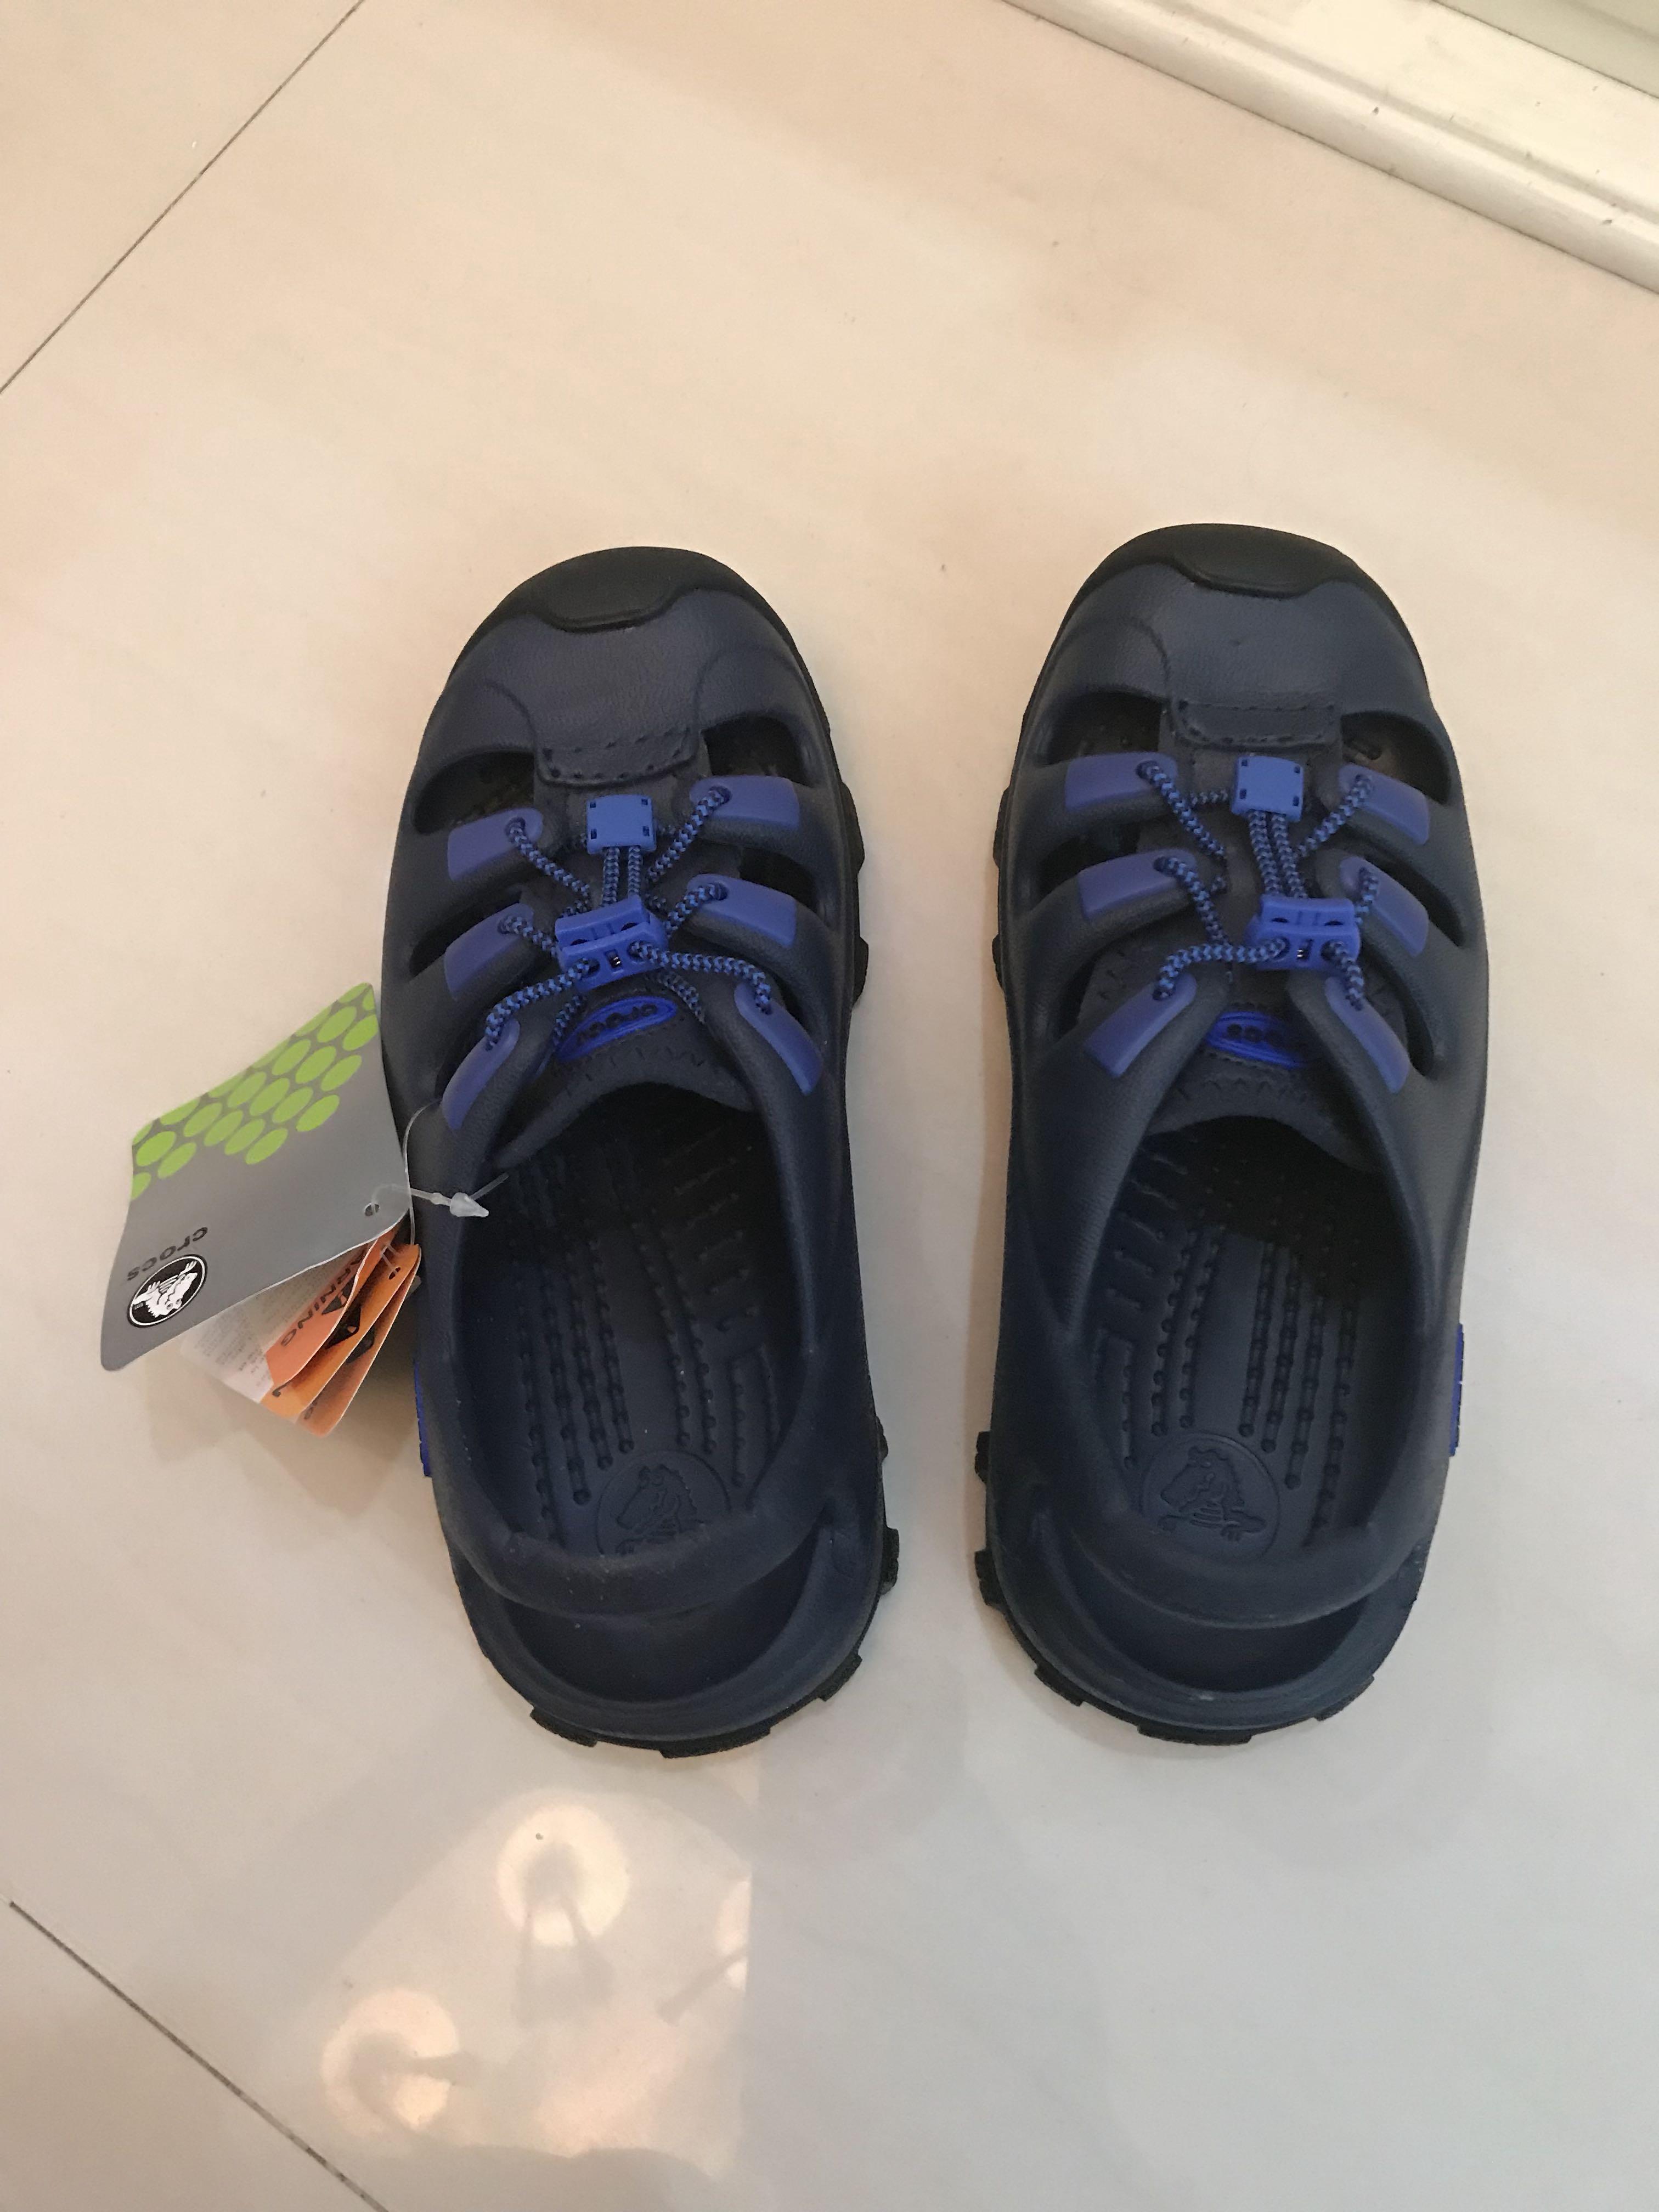 1e7471a4b46c Brand New Crocs Trailbreak Kids Adjustable Sandals J3 5